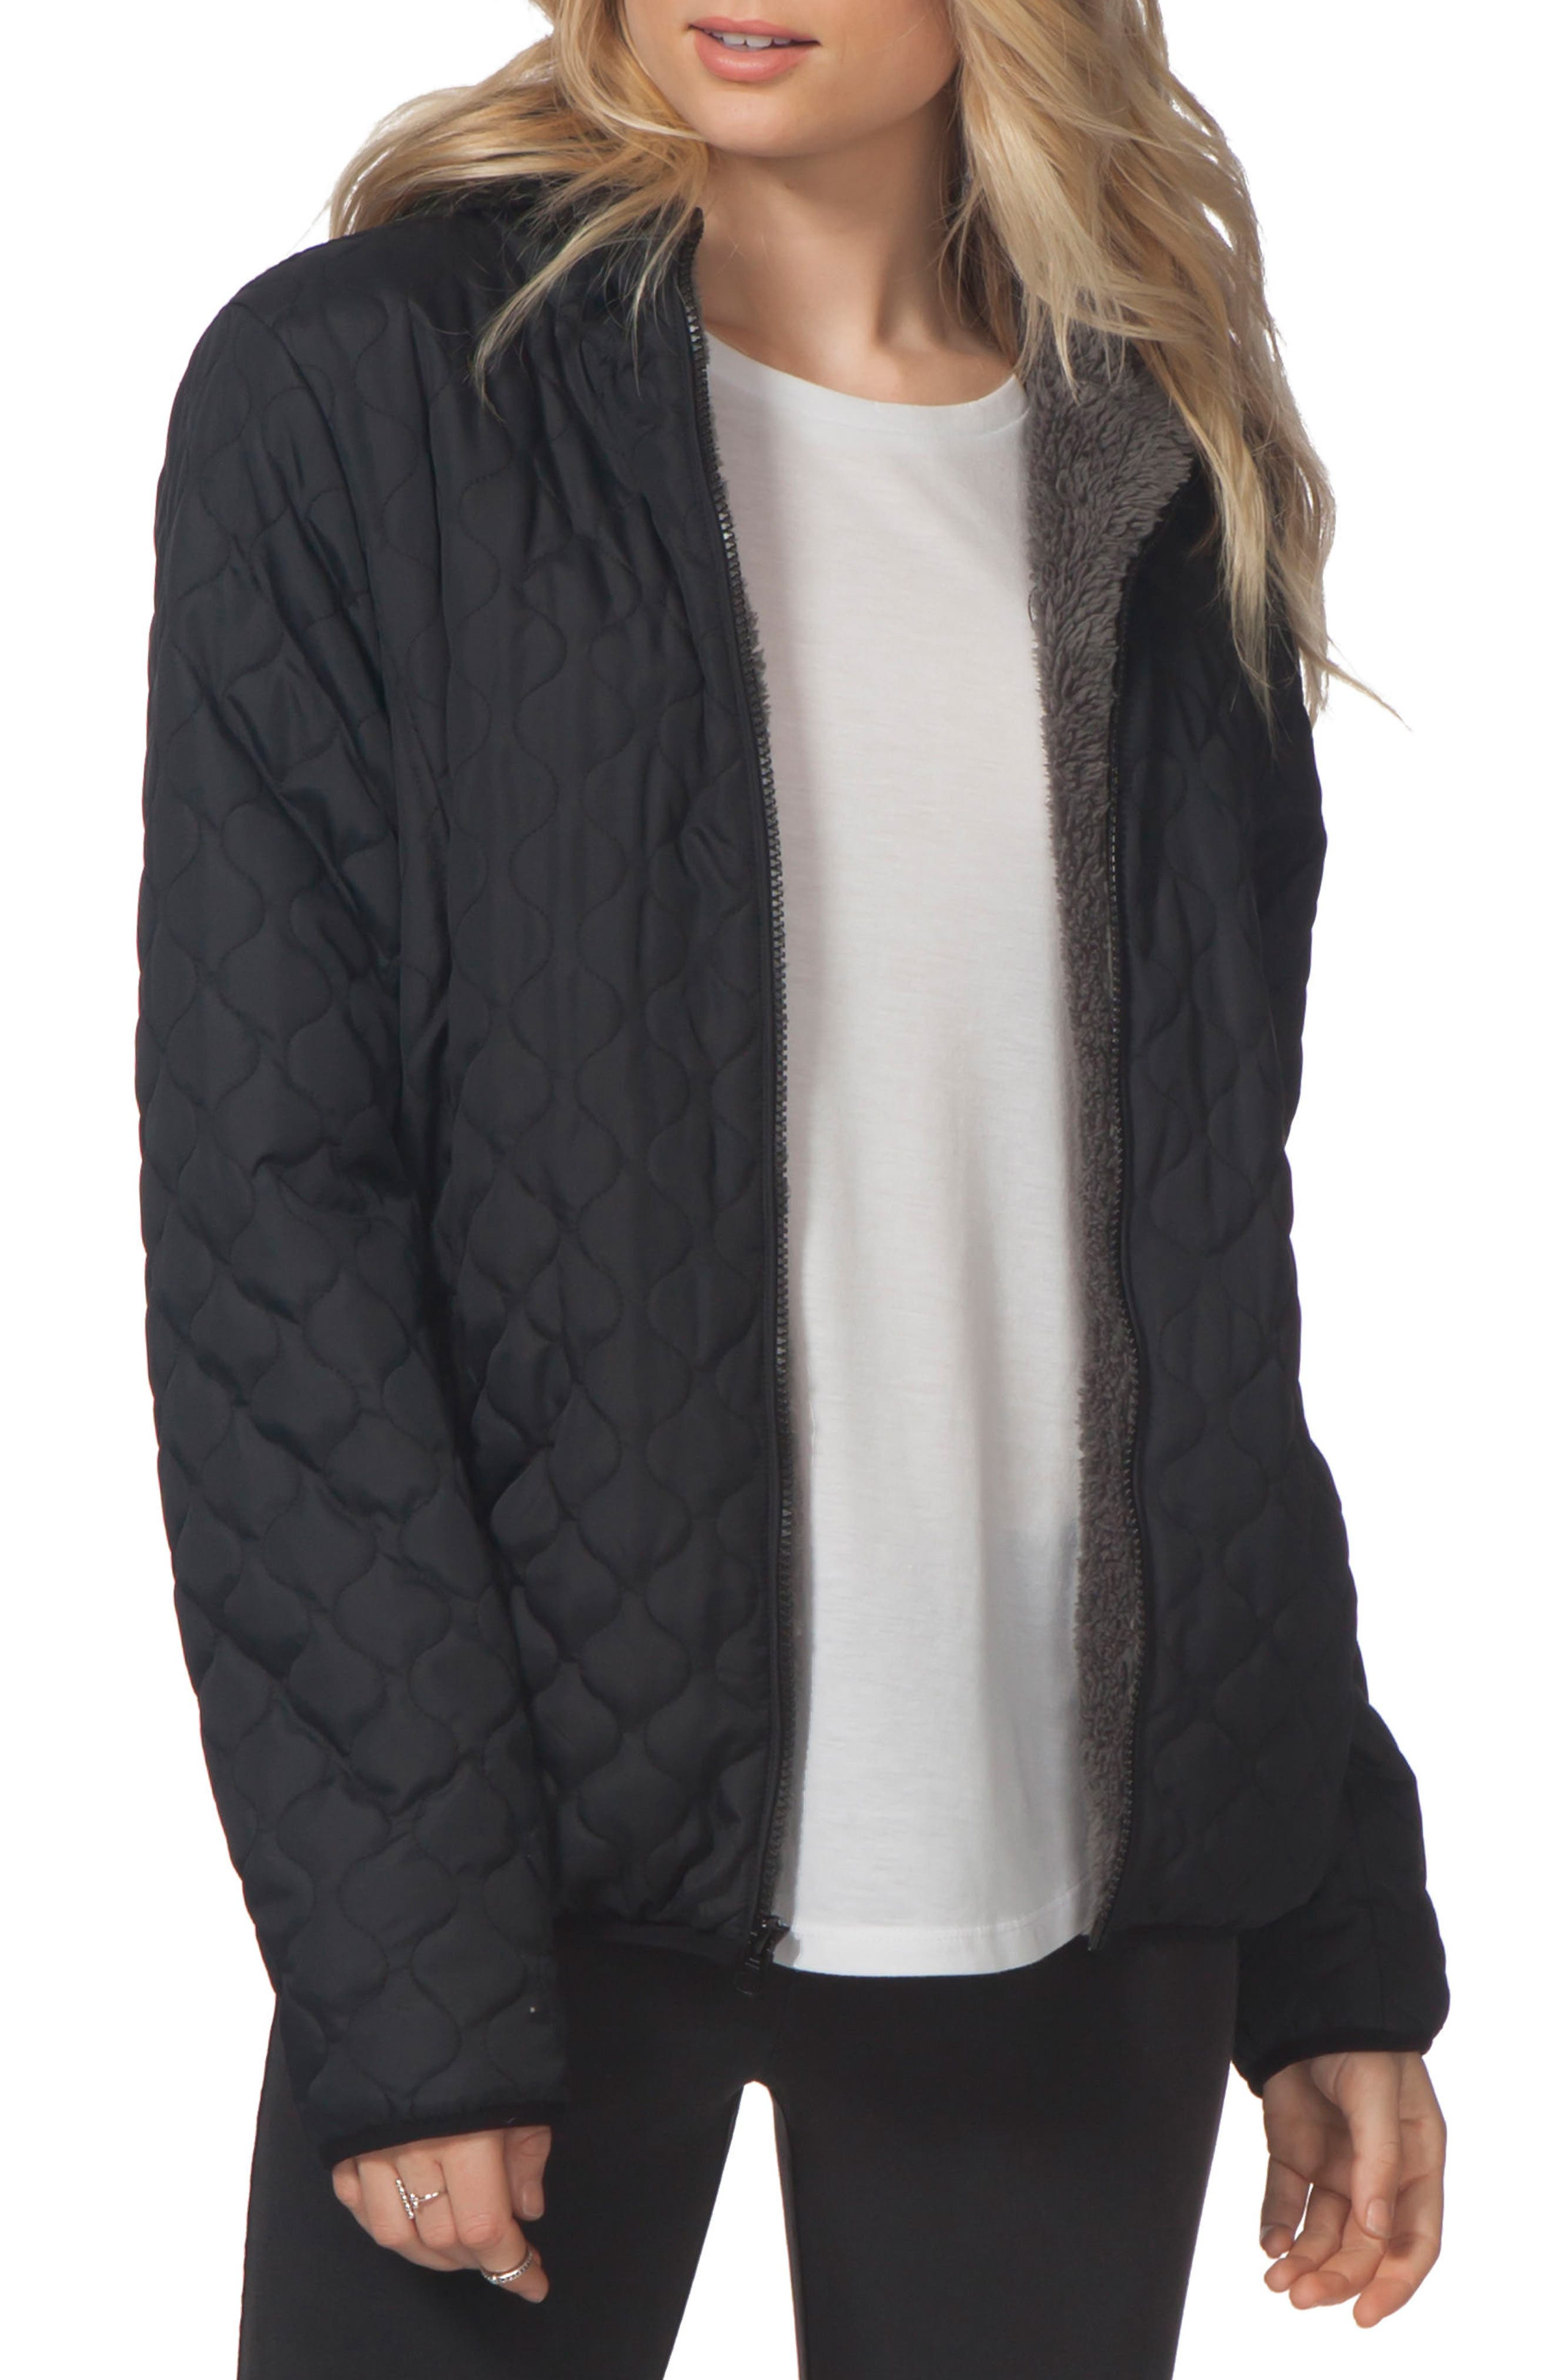 Rip Curl Anoeta Anti Series Jacket